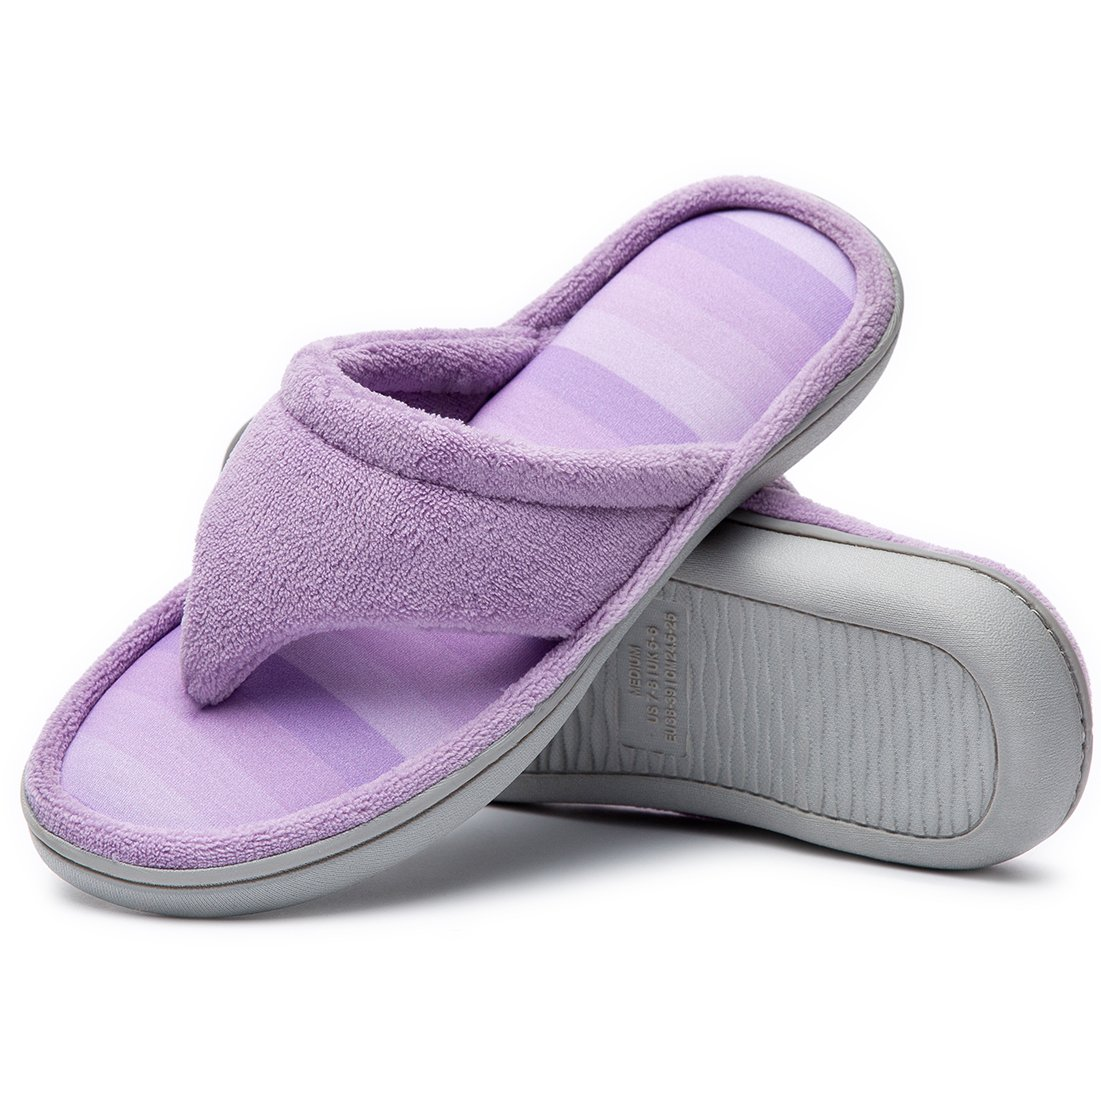 Cozy Niche Women's Microfiber Gradational Color Knit Thong Slippers, Textured Memory Foam Spa Flip-Flops (7-8 B(M) US, Purple)